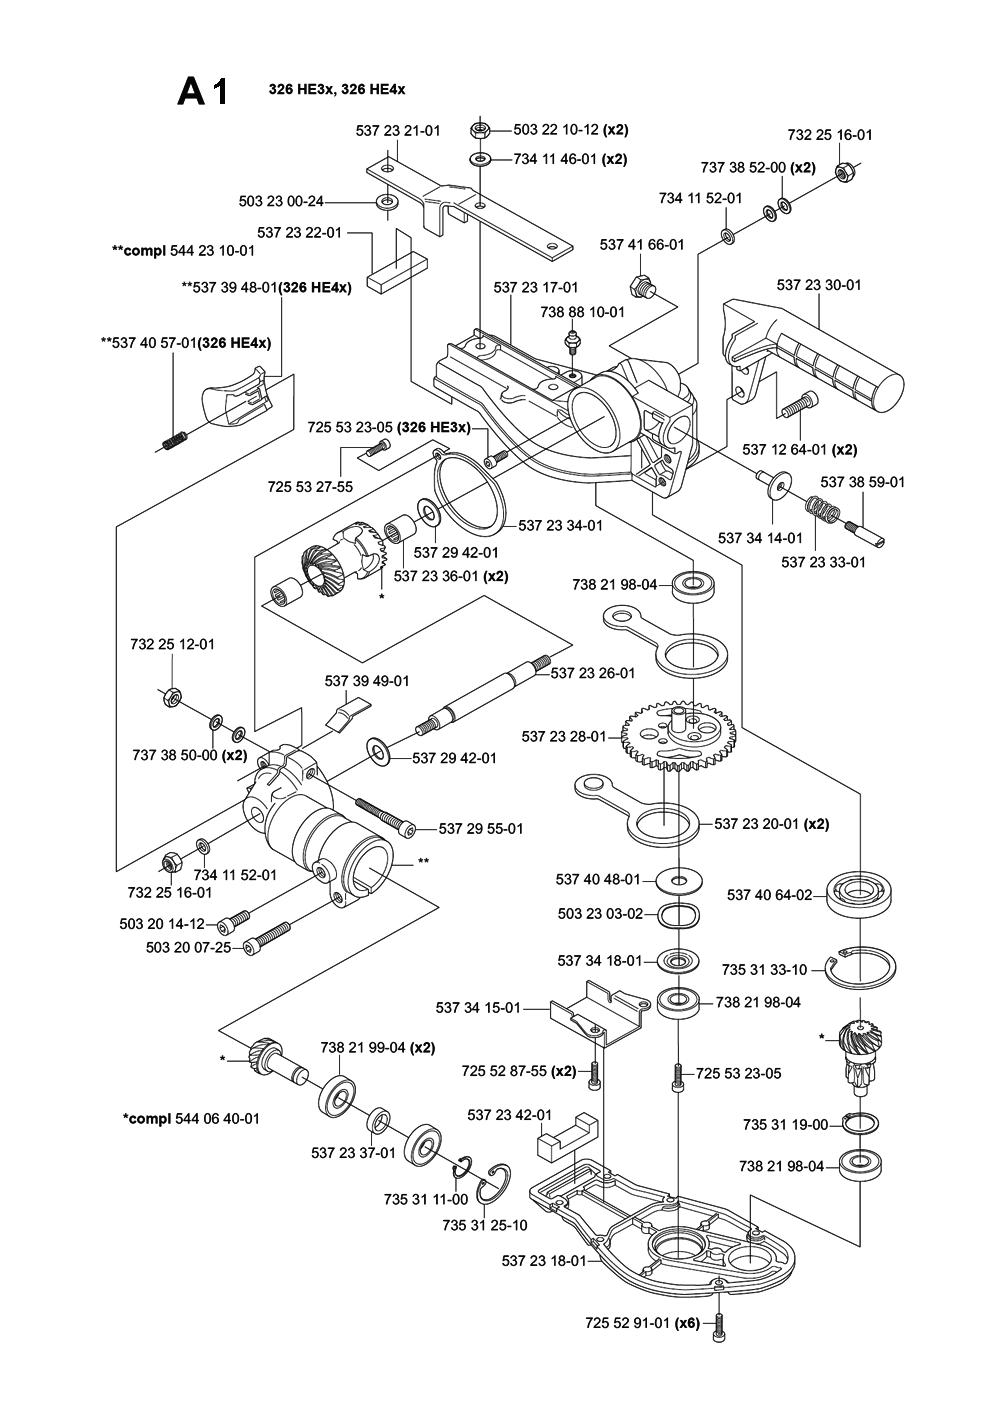 Buy Husqvarna 326 HE3X-(31) Replacement Tool Parts